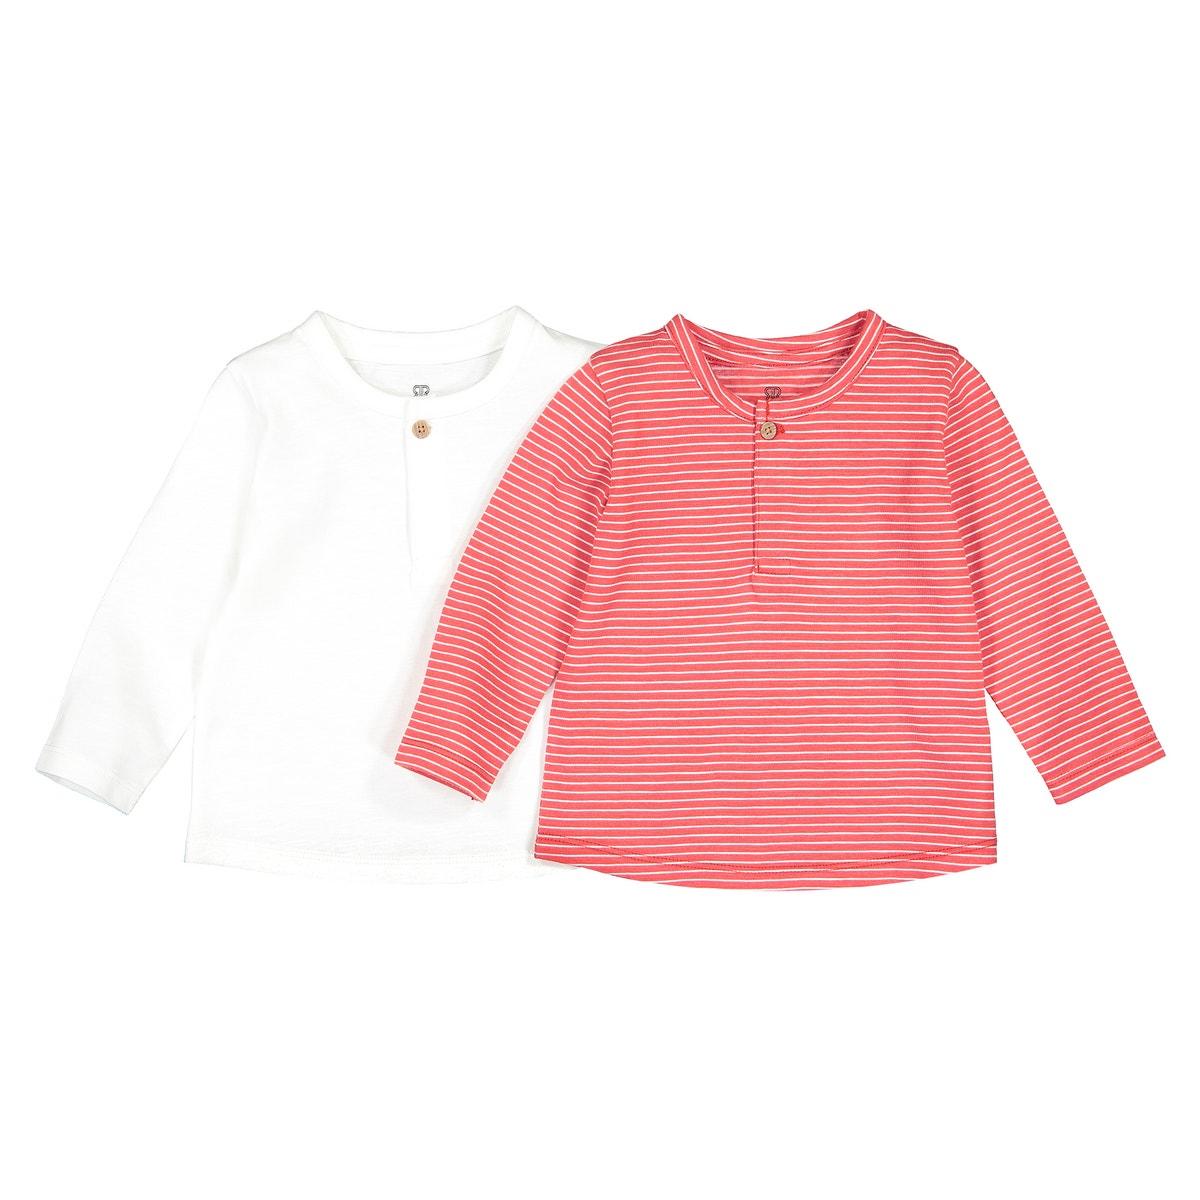 Комплект из 2 футболок R mini 2210703 / GGY034